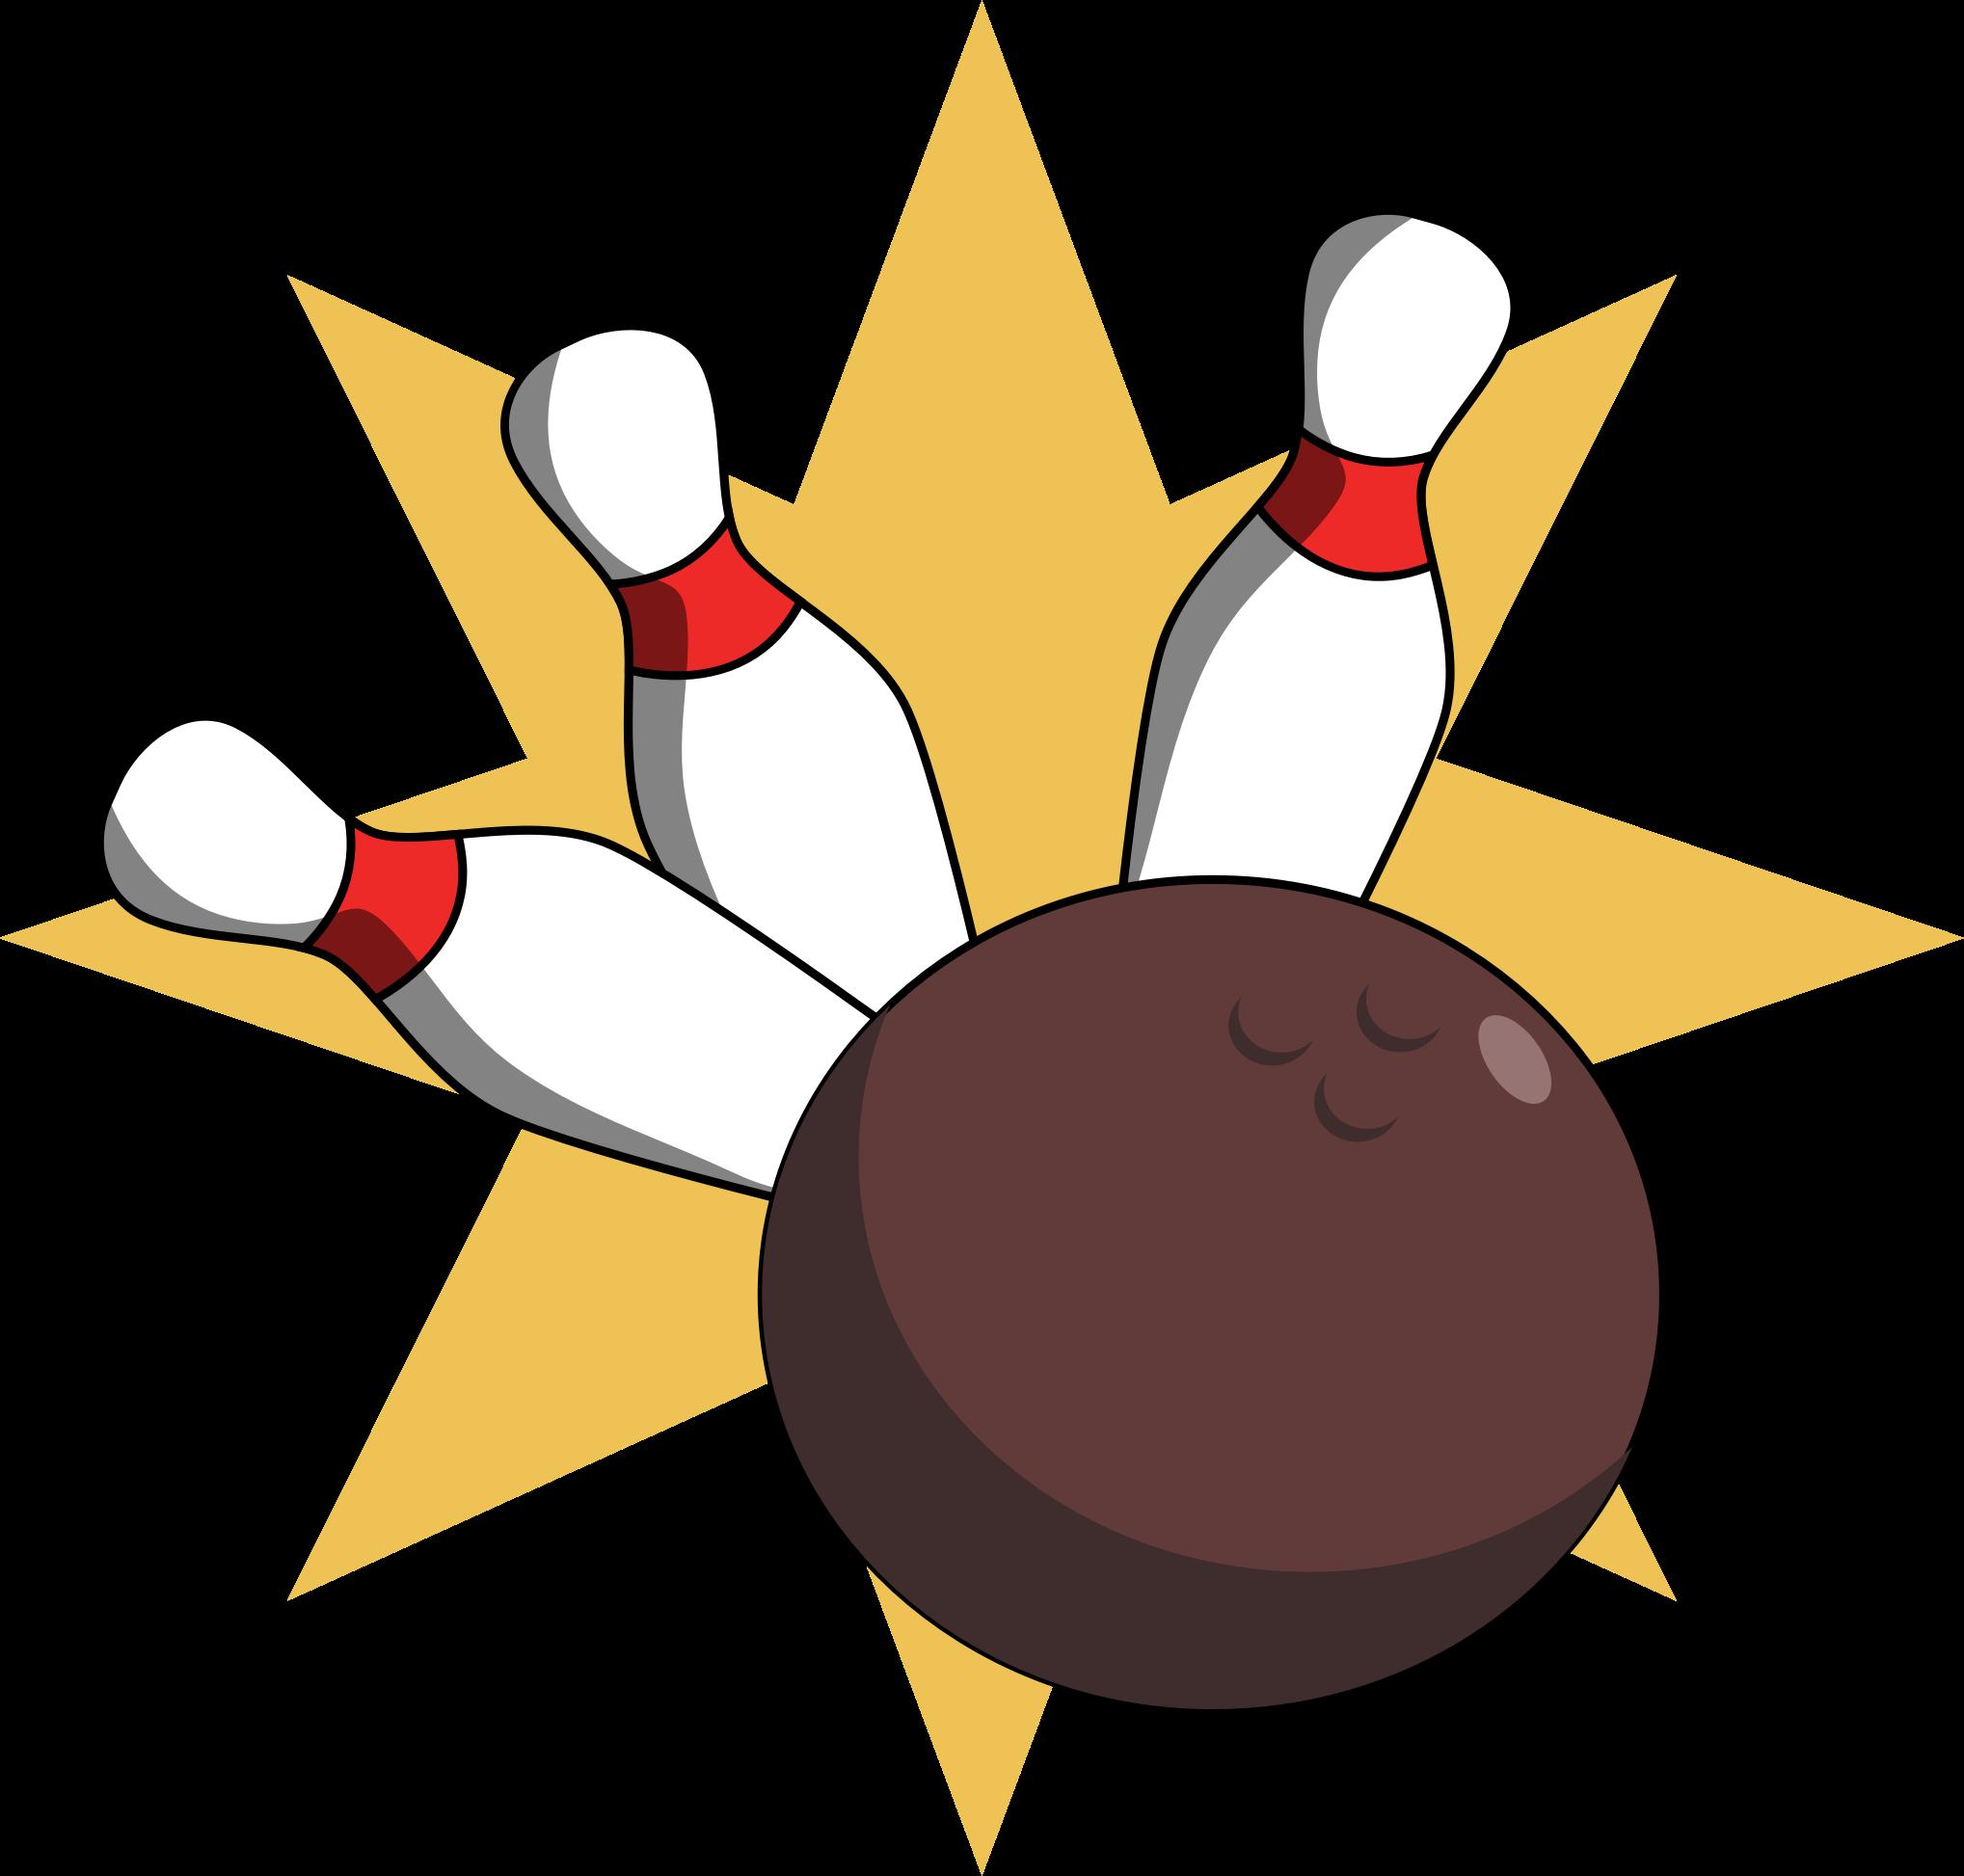 Logo clipart bowling. Big image png